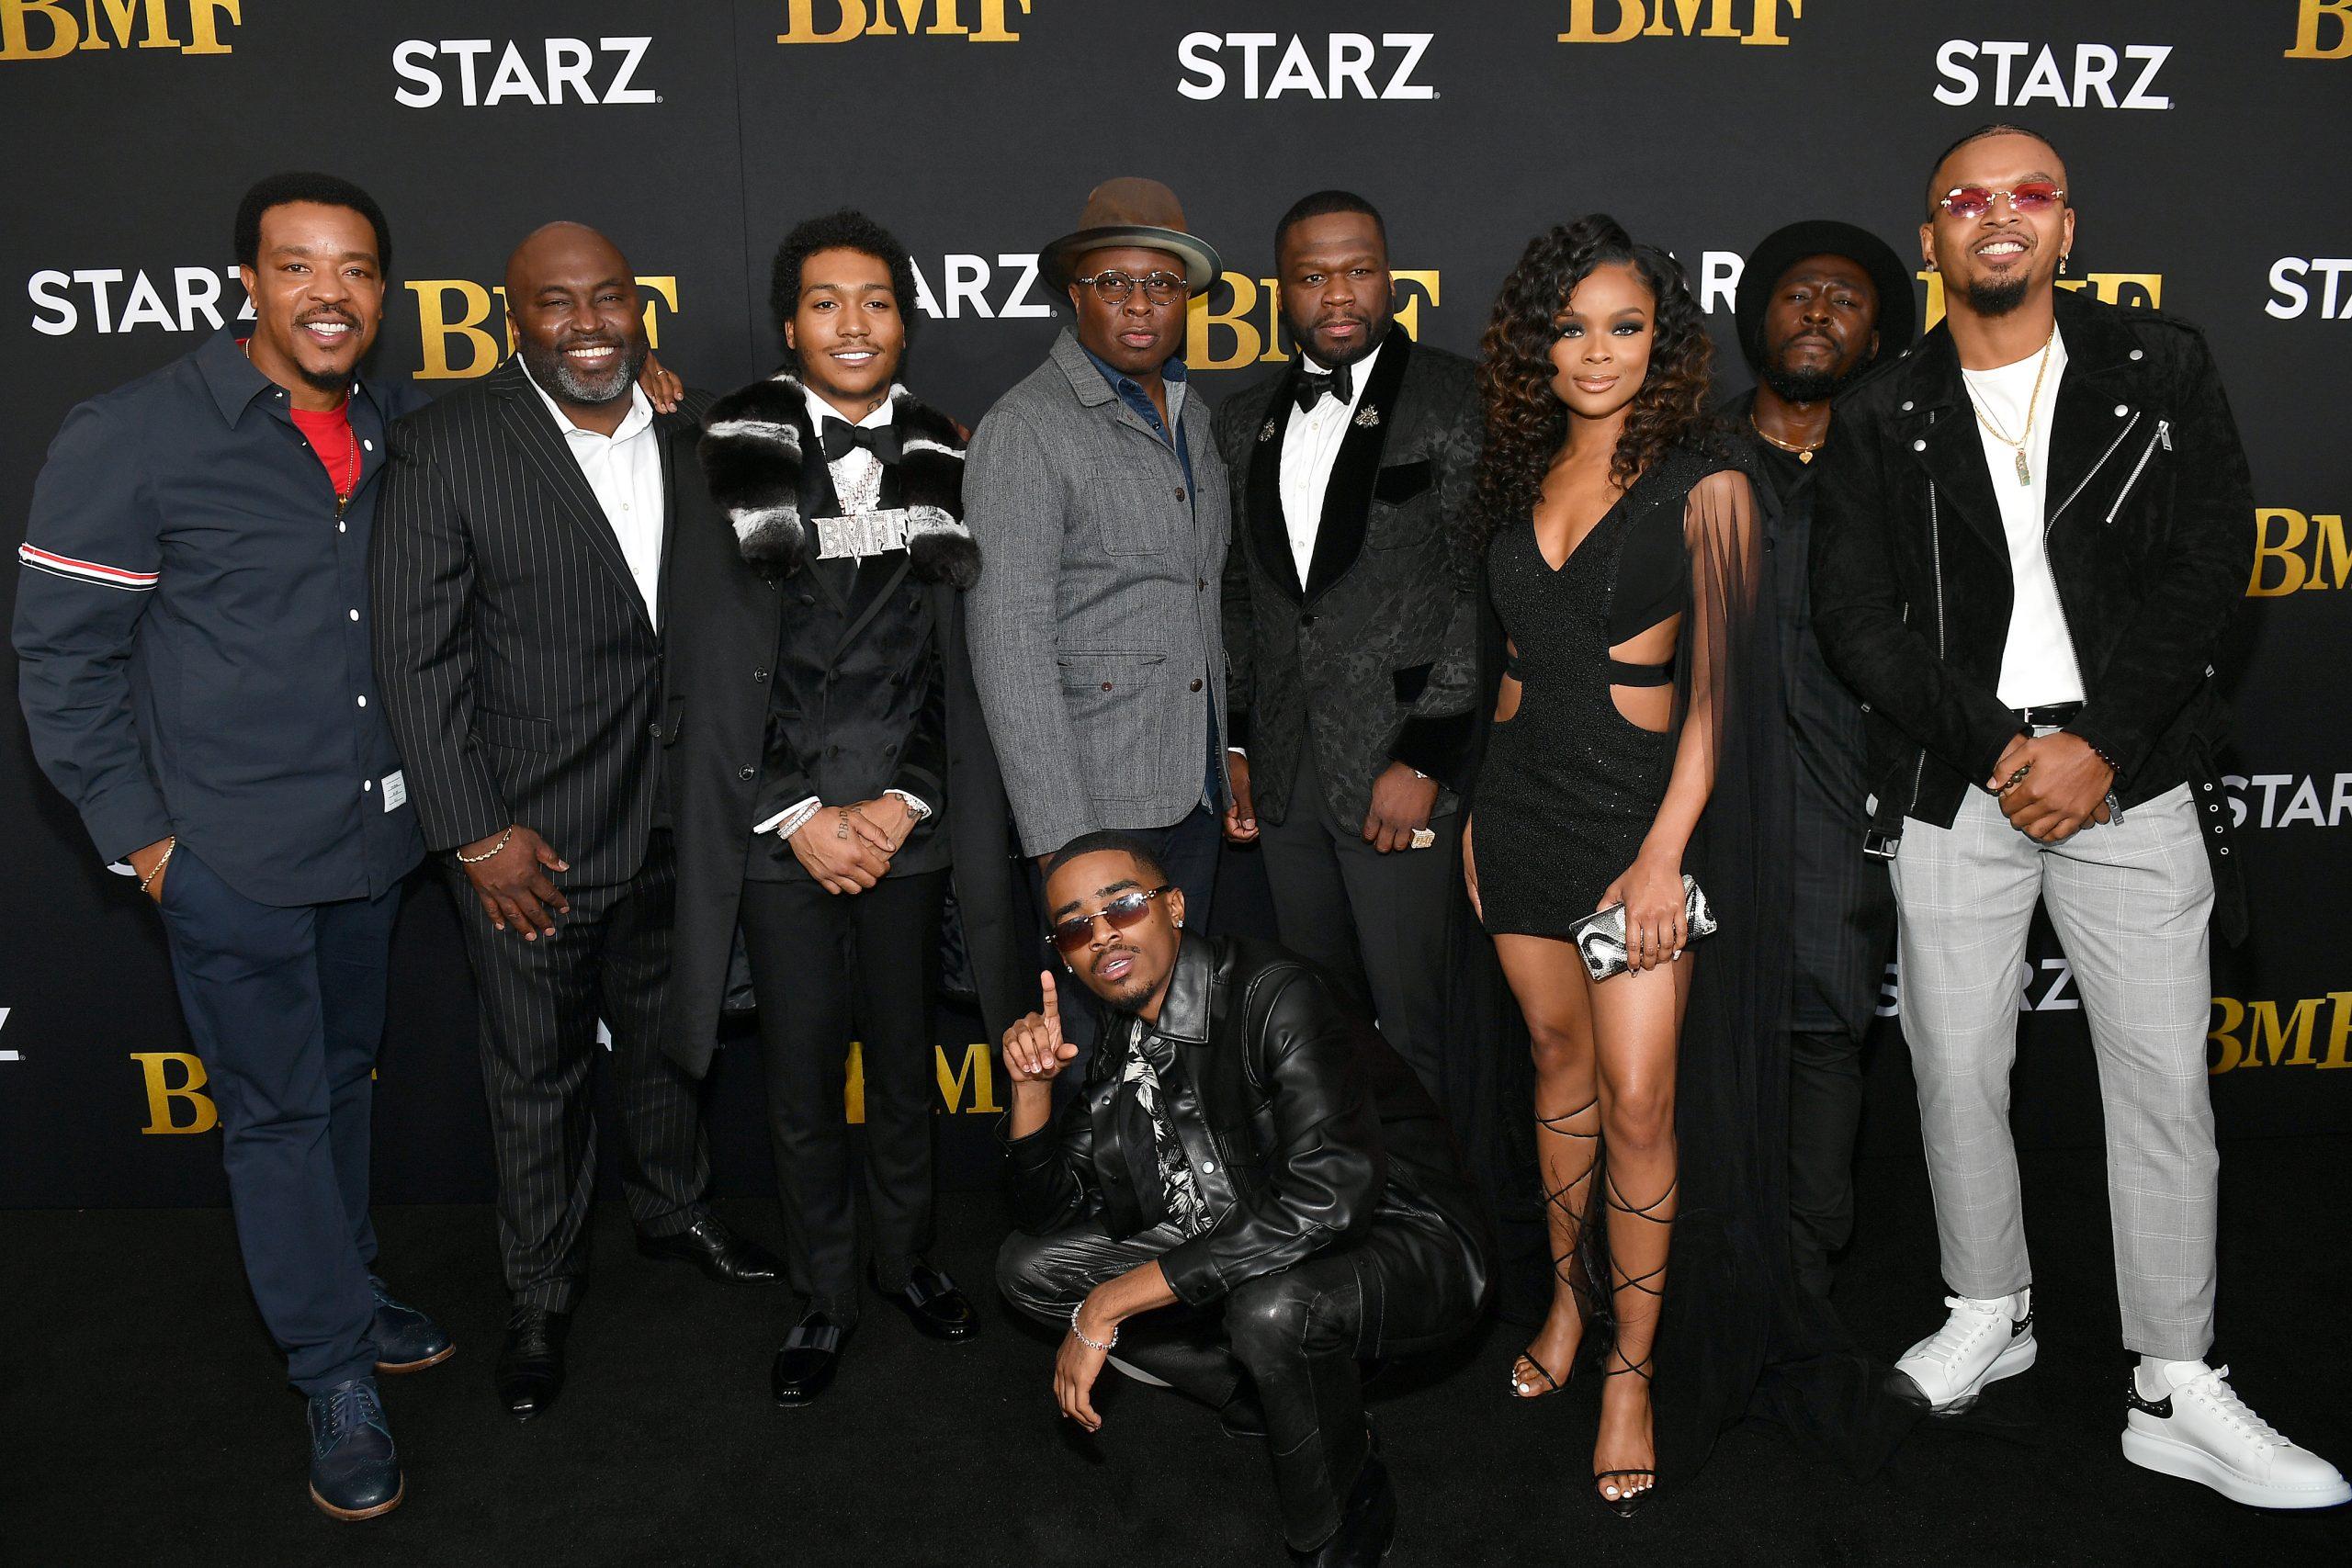 [PHOTOS] 50 Cent, Kash Doll, Kandi Burress, Jacob Latimore and More Celebs Walk The 'BMF' Premiere Red Carpet